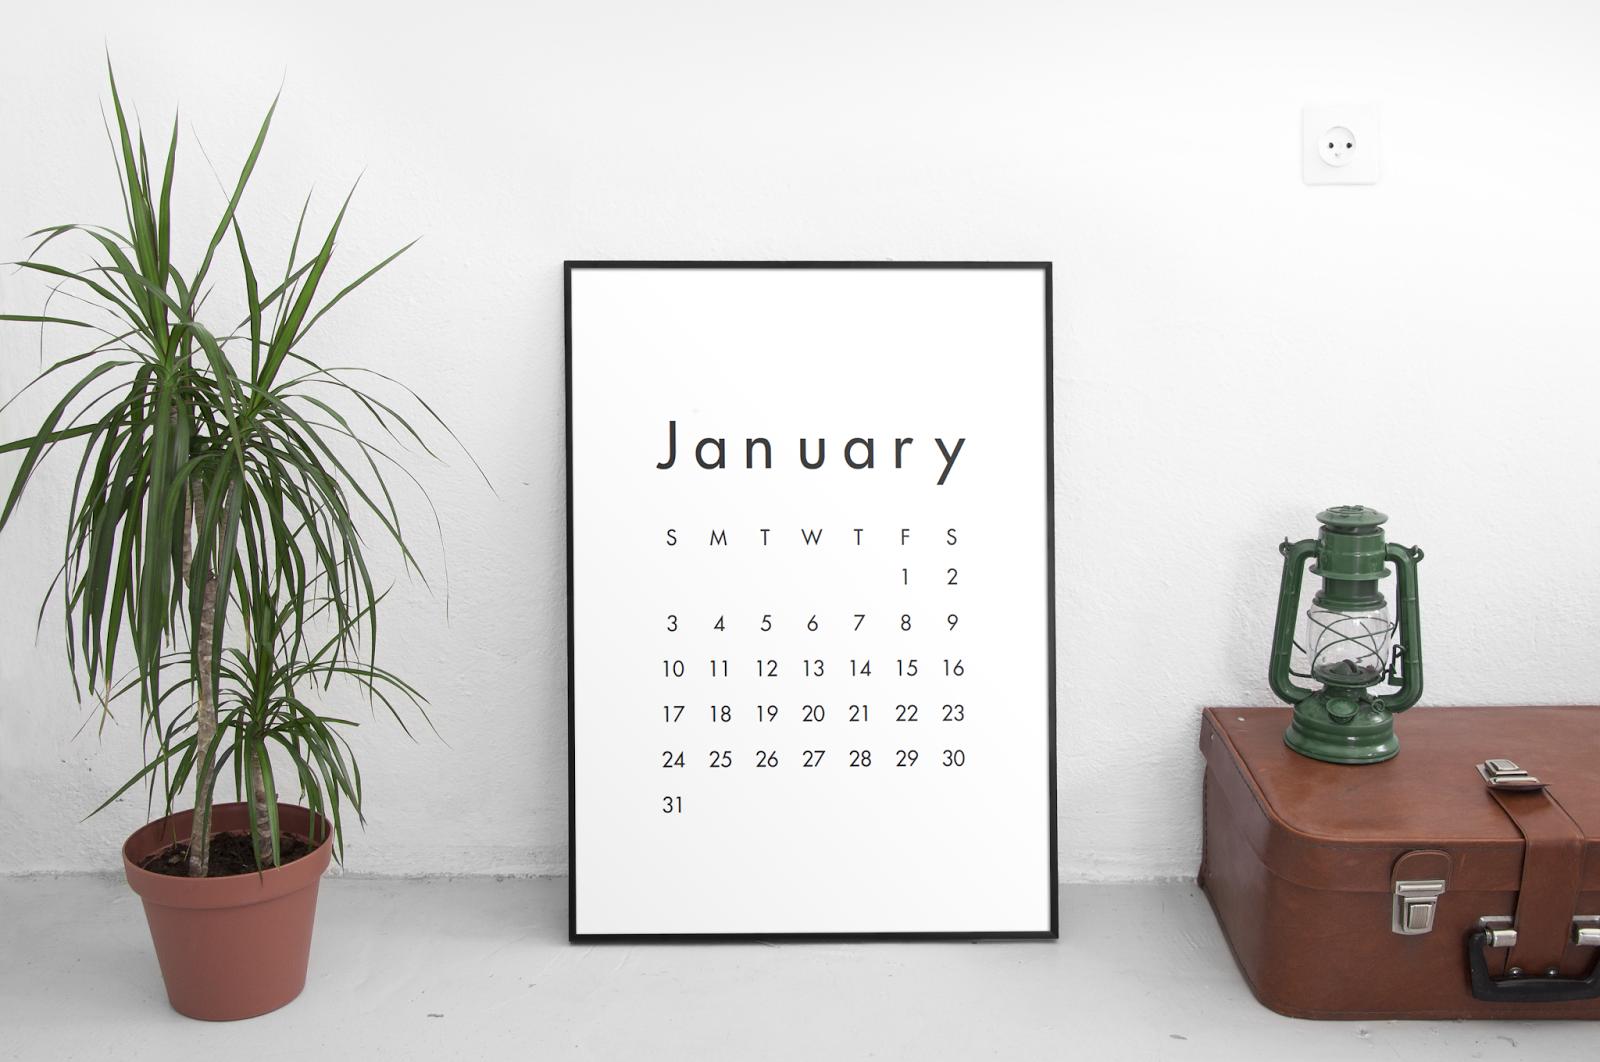 Minimalist // Free 2016 Calendar  Printable by book flower and tea  #printable #free #minimalist #minimalism #minimal #calendar #2016